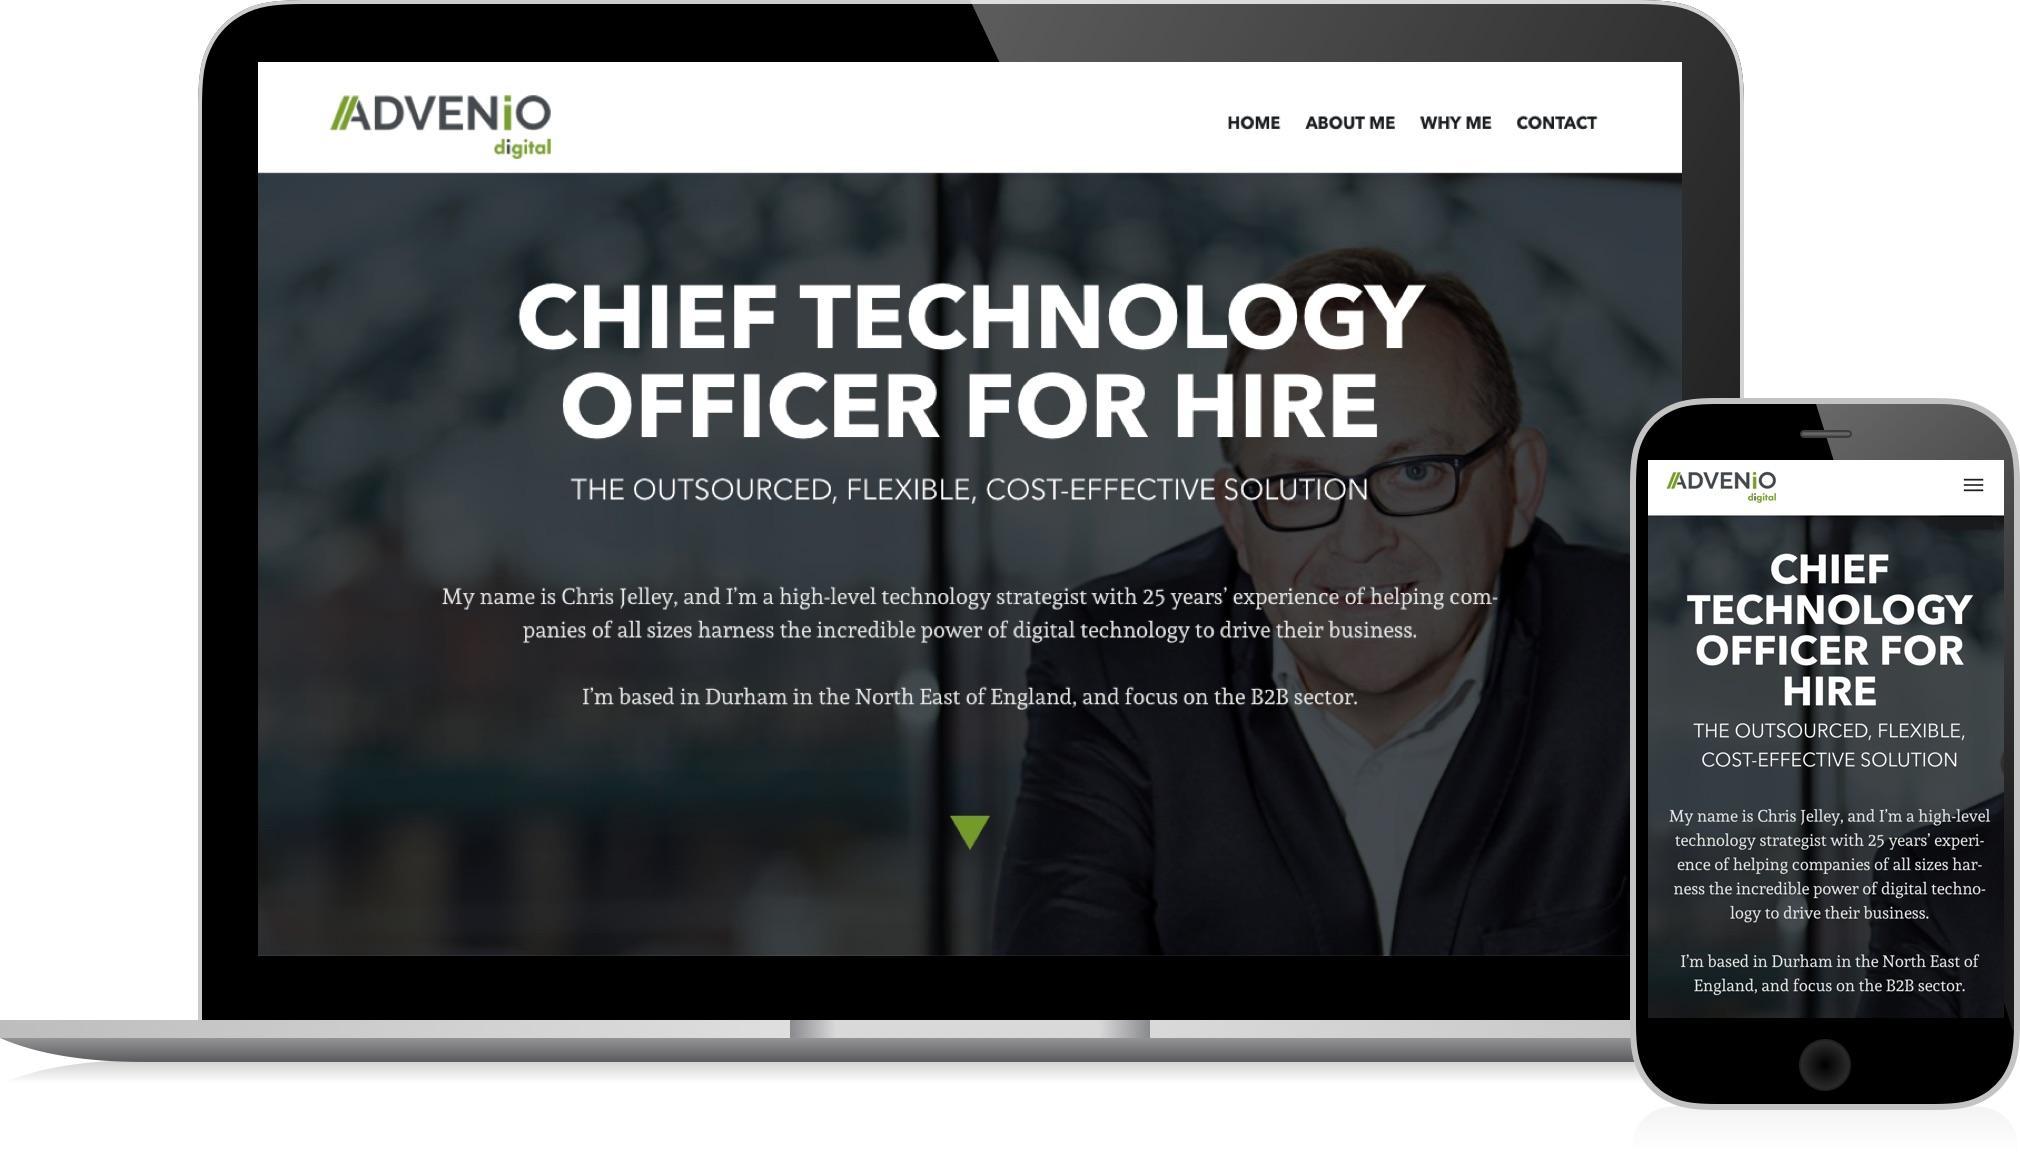 Advenio Digital - responsive website by HeavyGuru web design, London